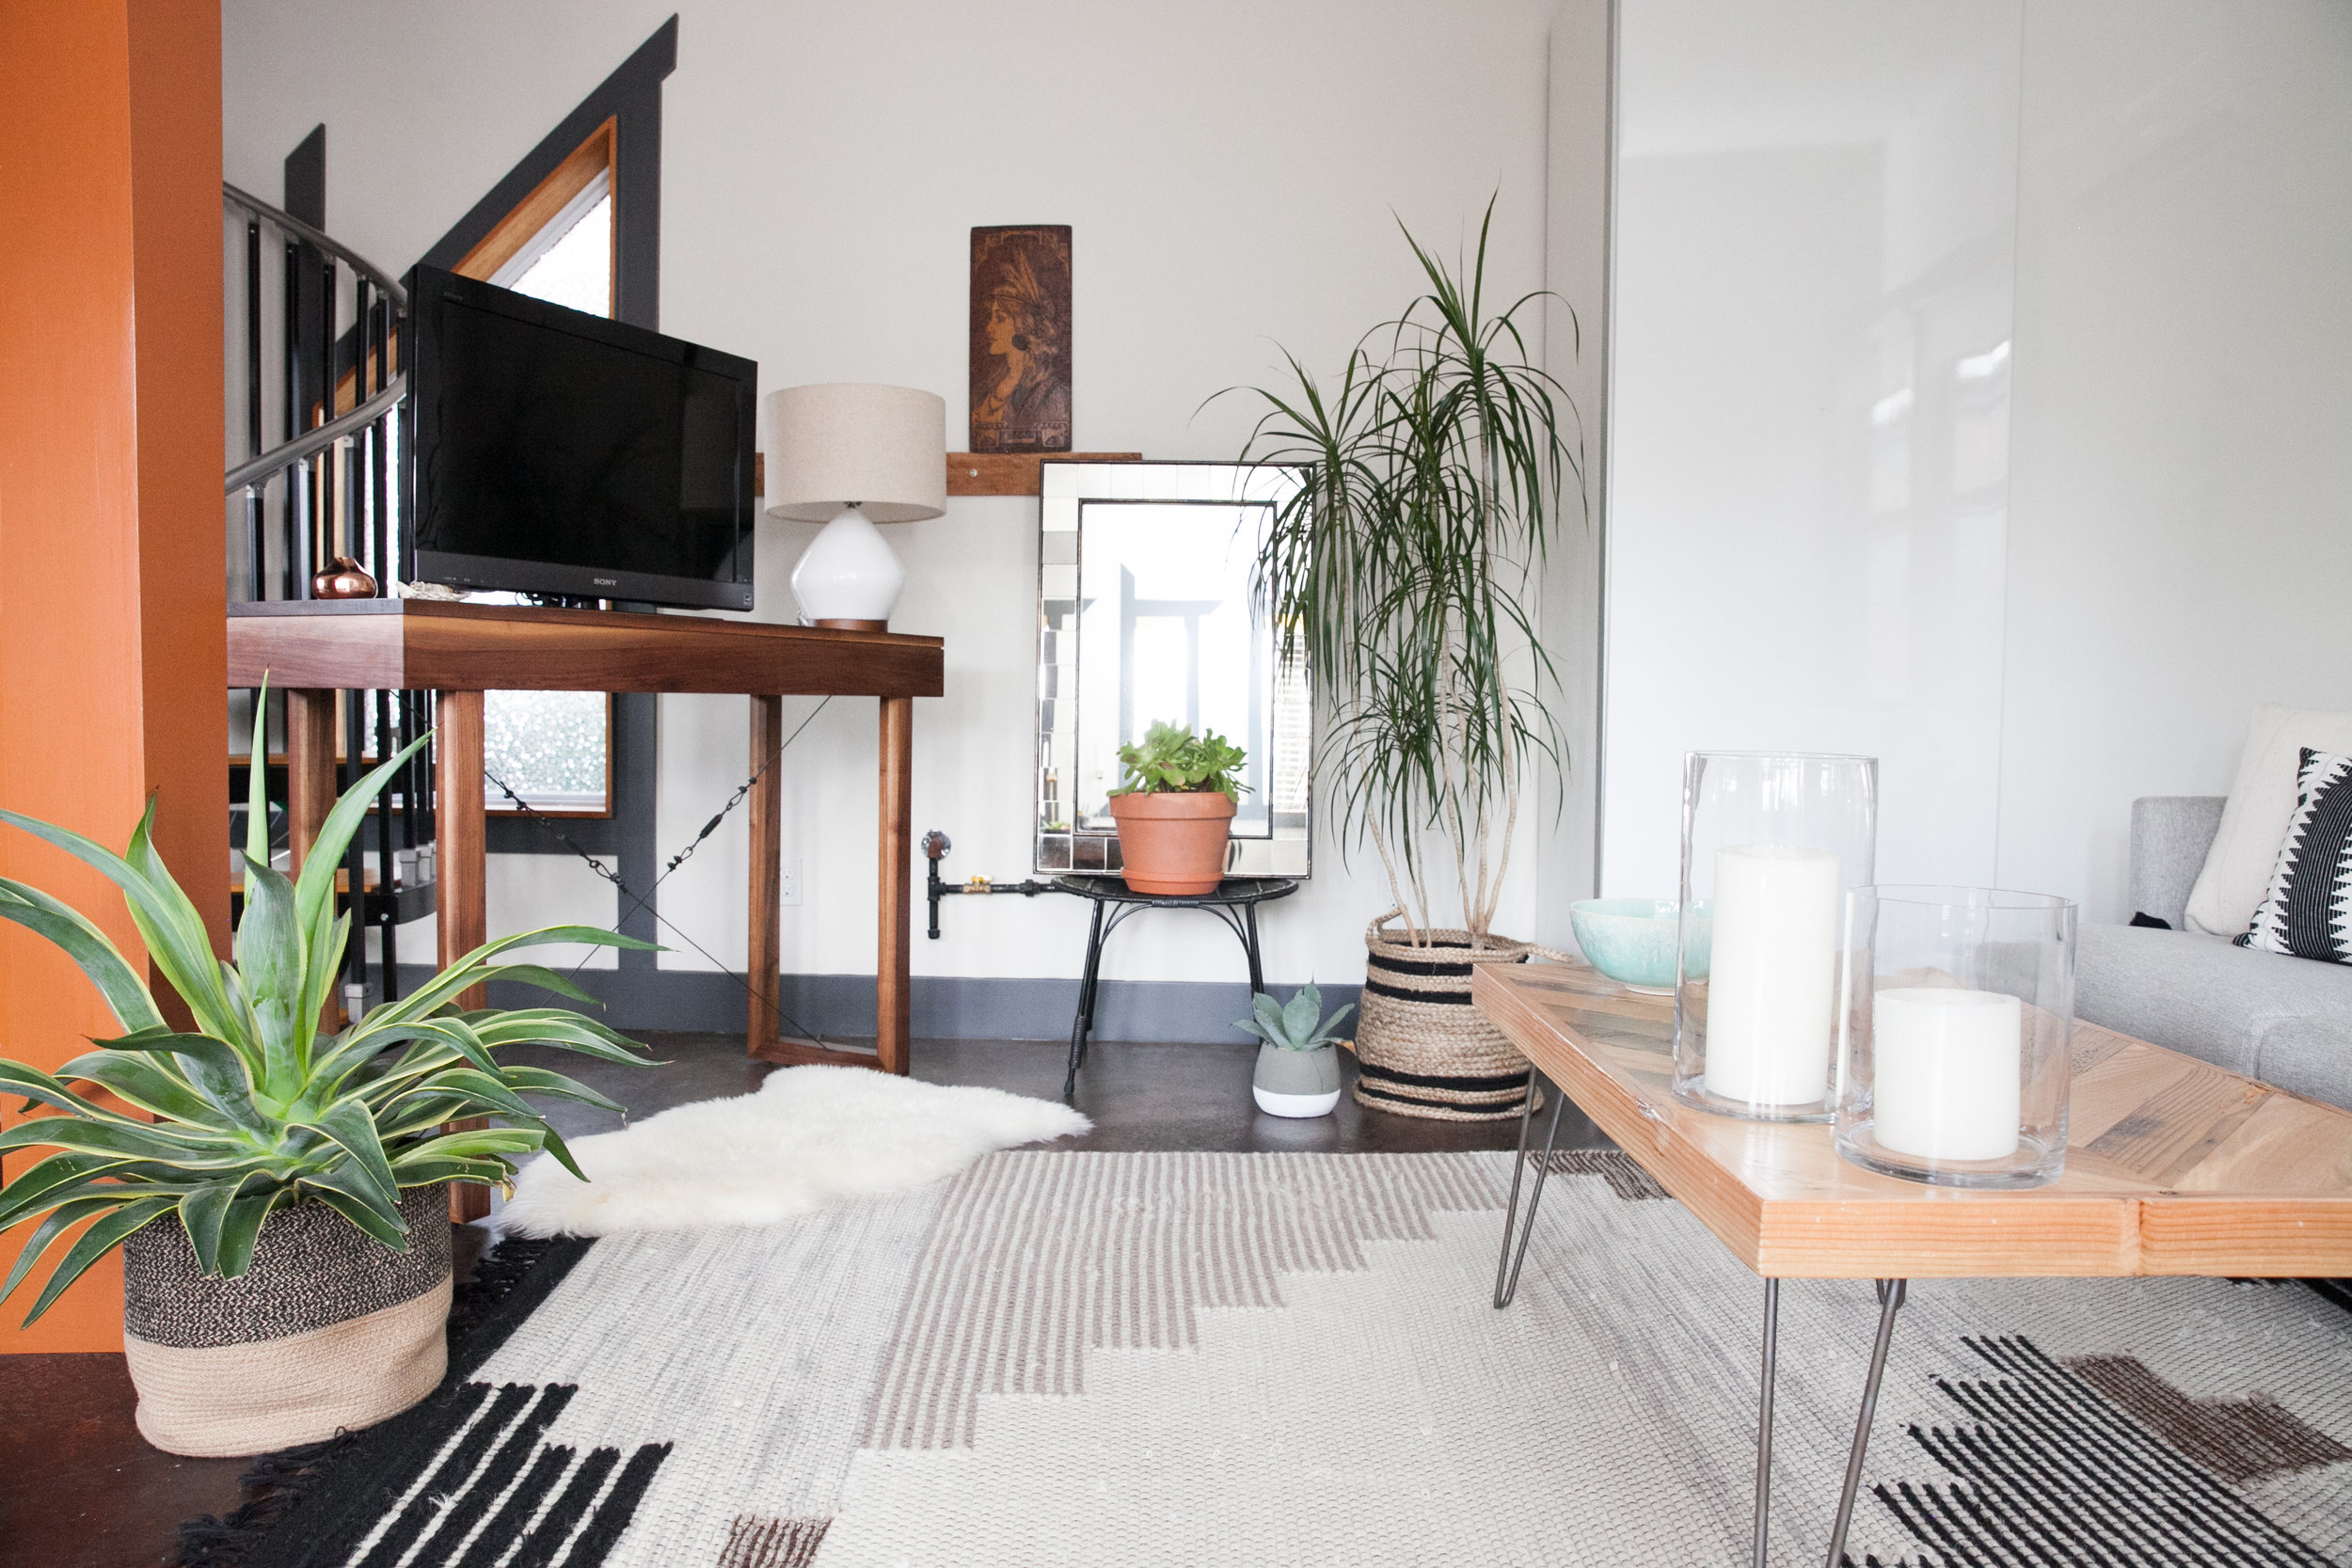 LisaDiederichPhotography_ApartmentTherapy_ErinWalsh-7.jpg